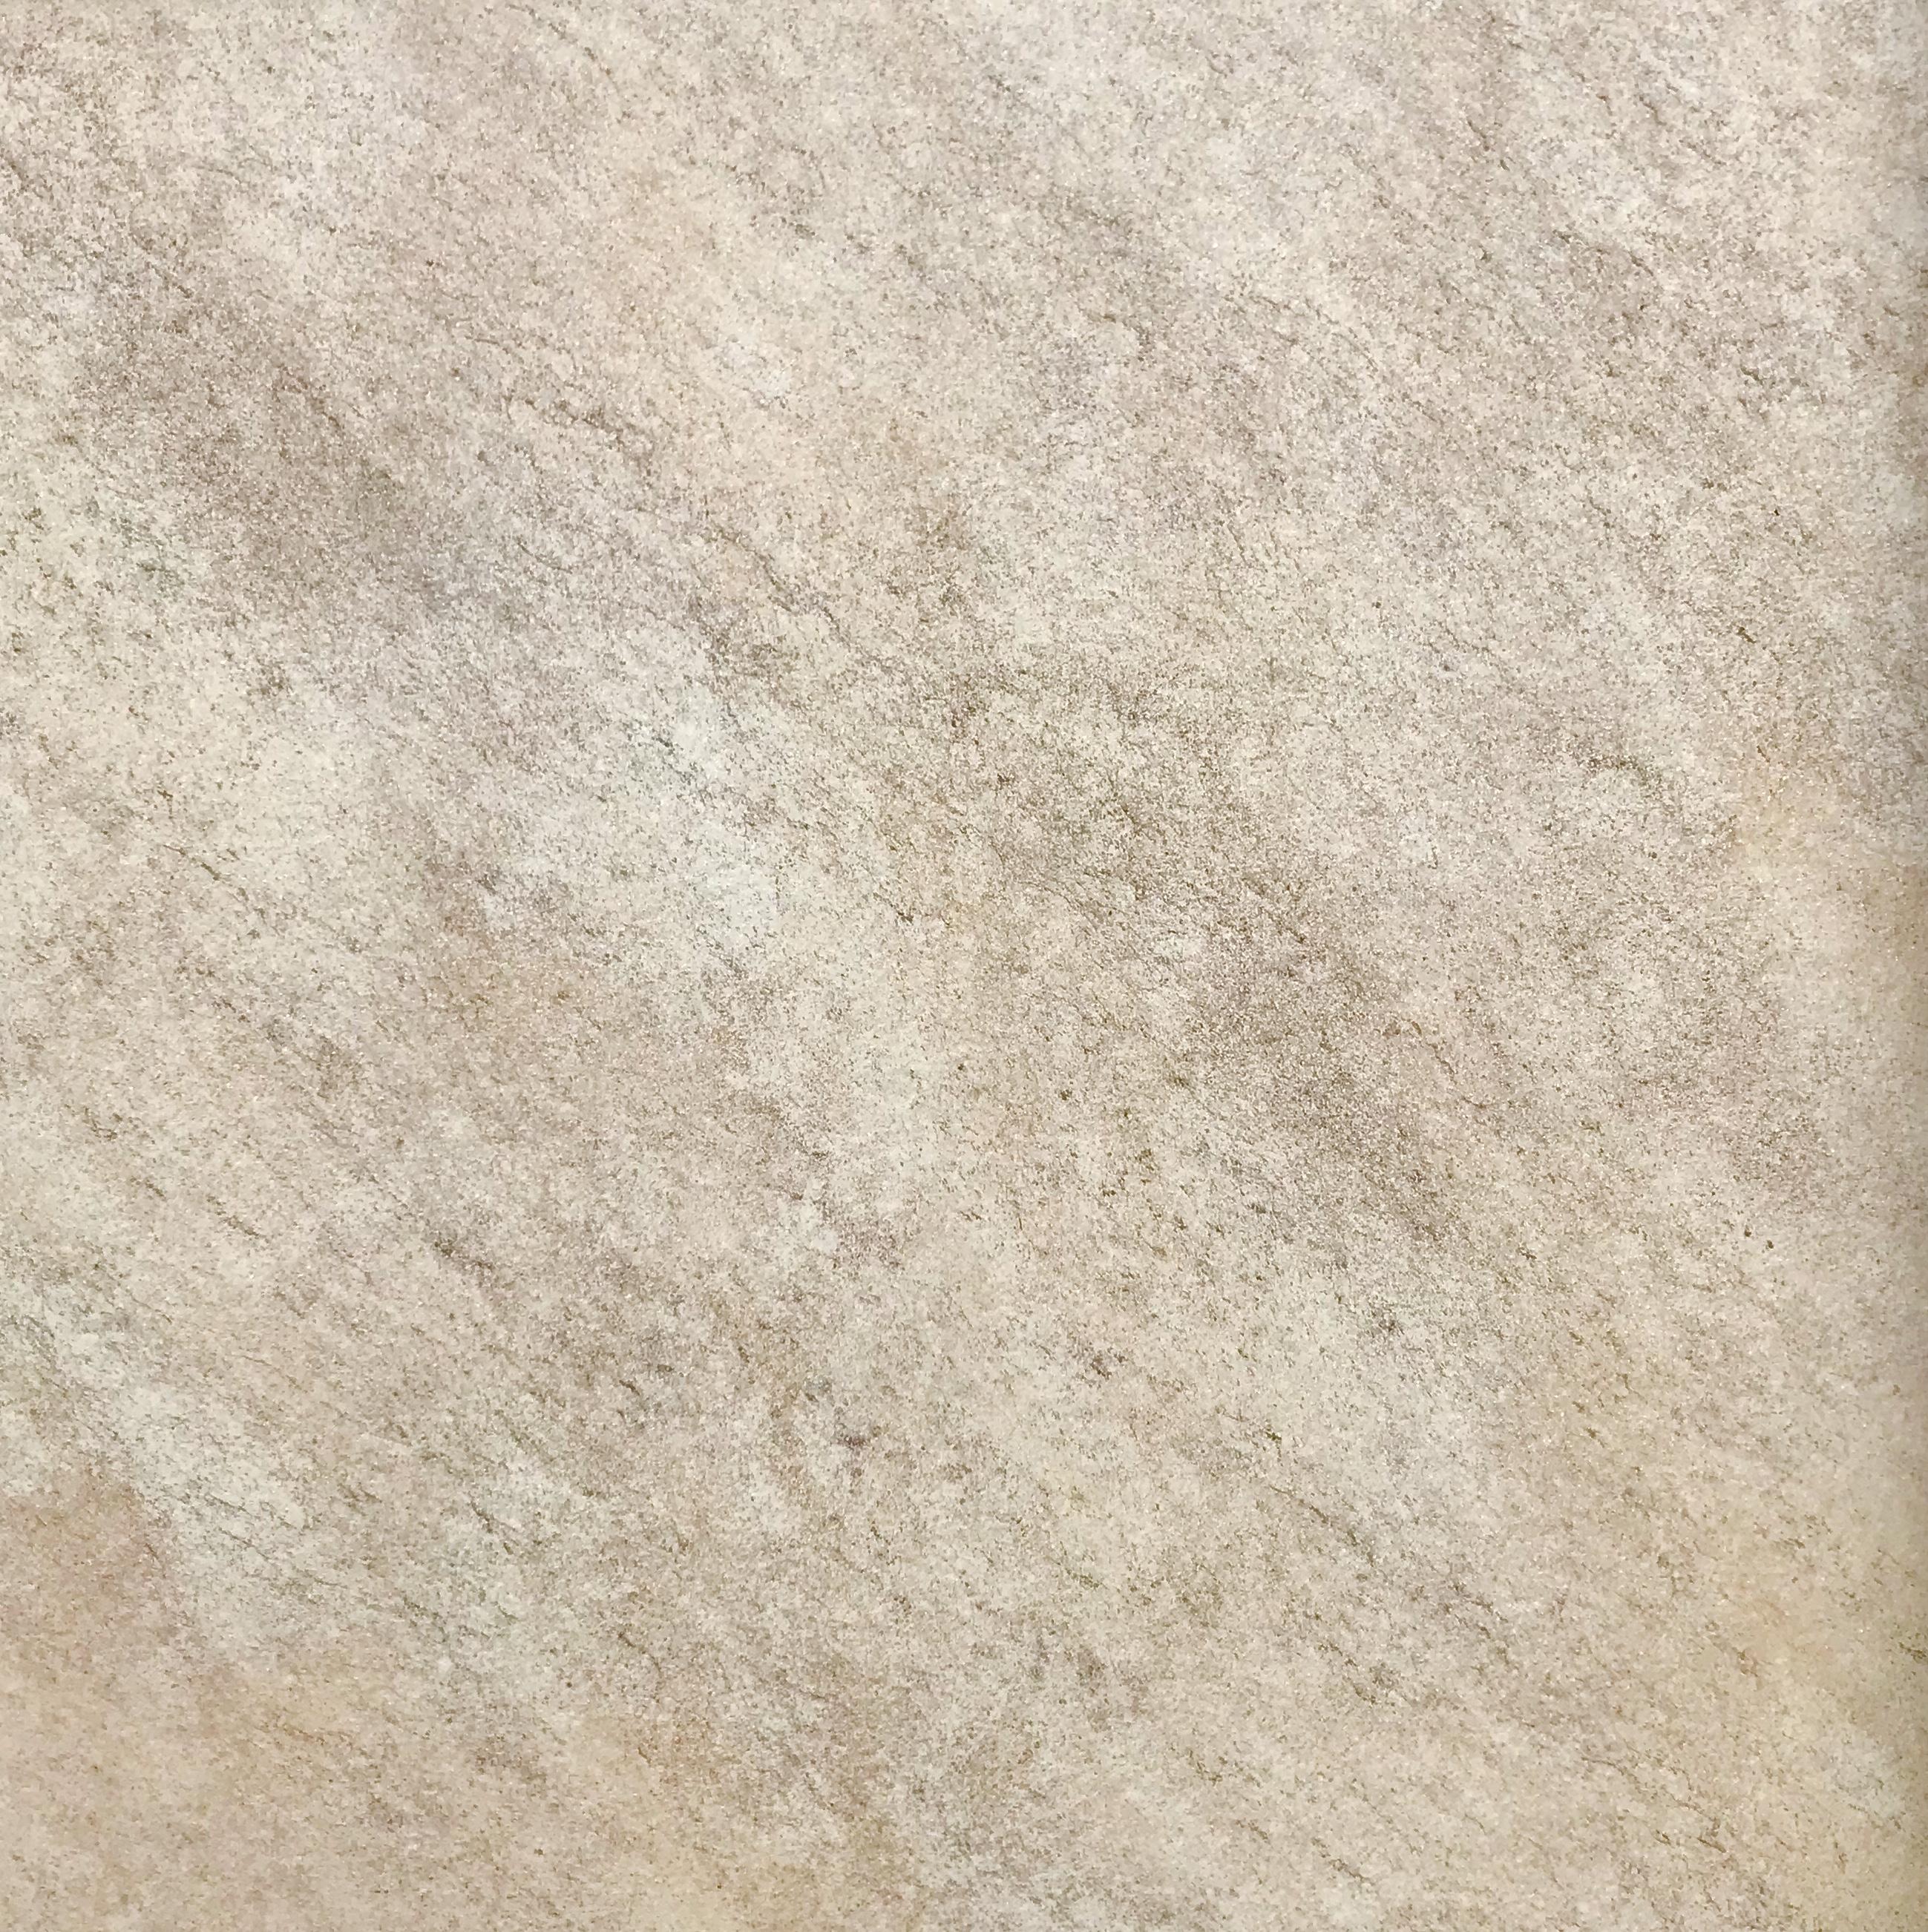 Meissen Atakama 2.0 matt Terrassenplatte Beige 60x60